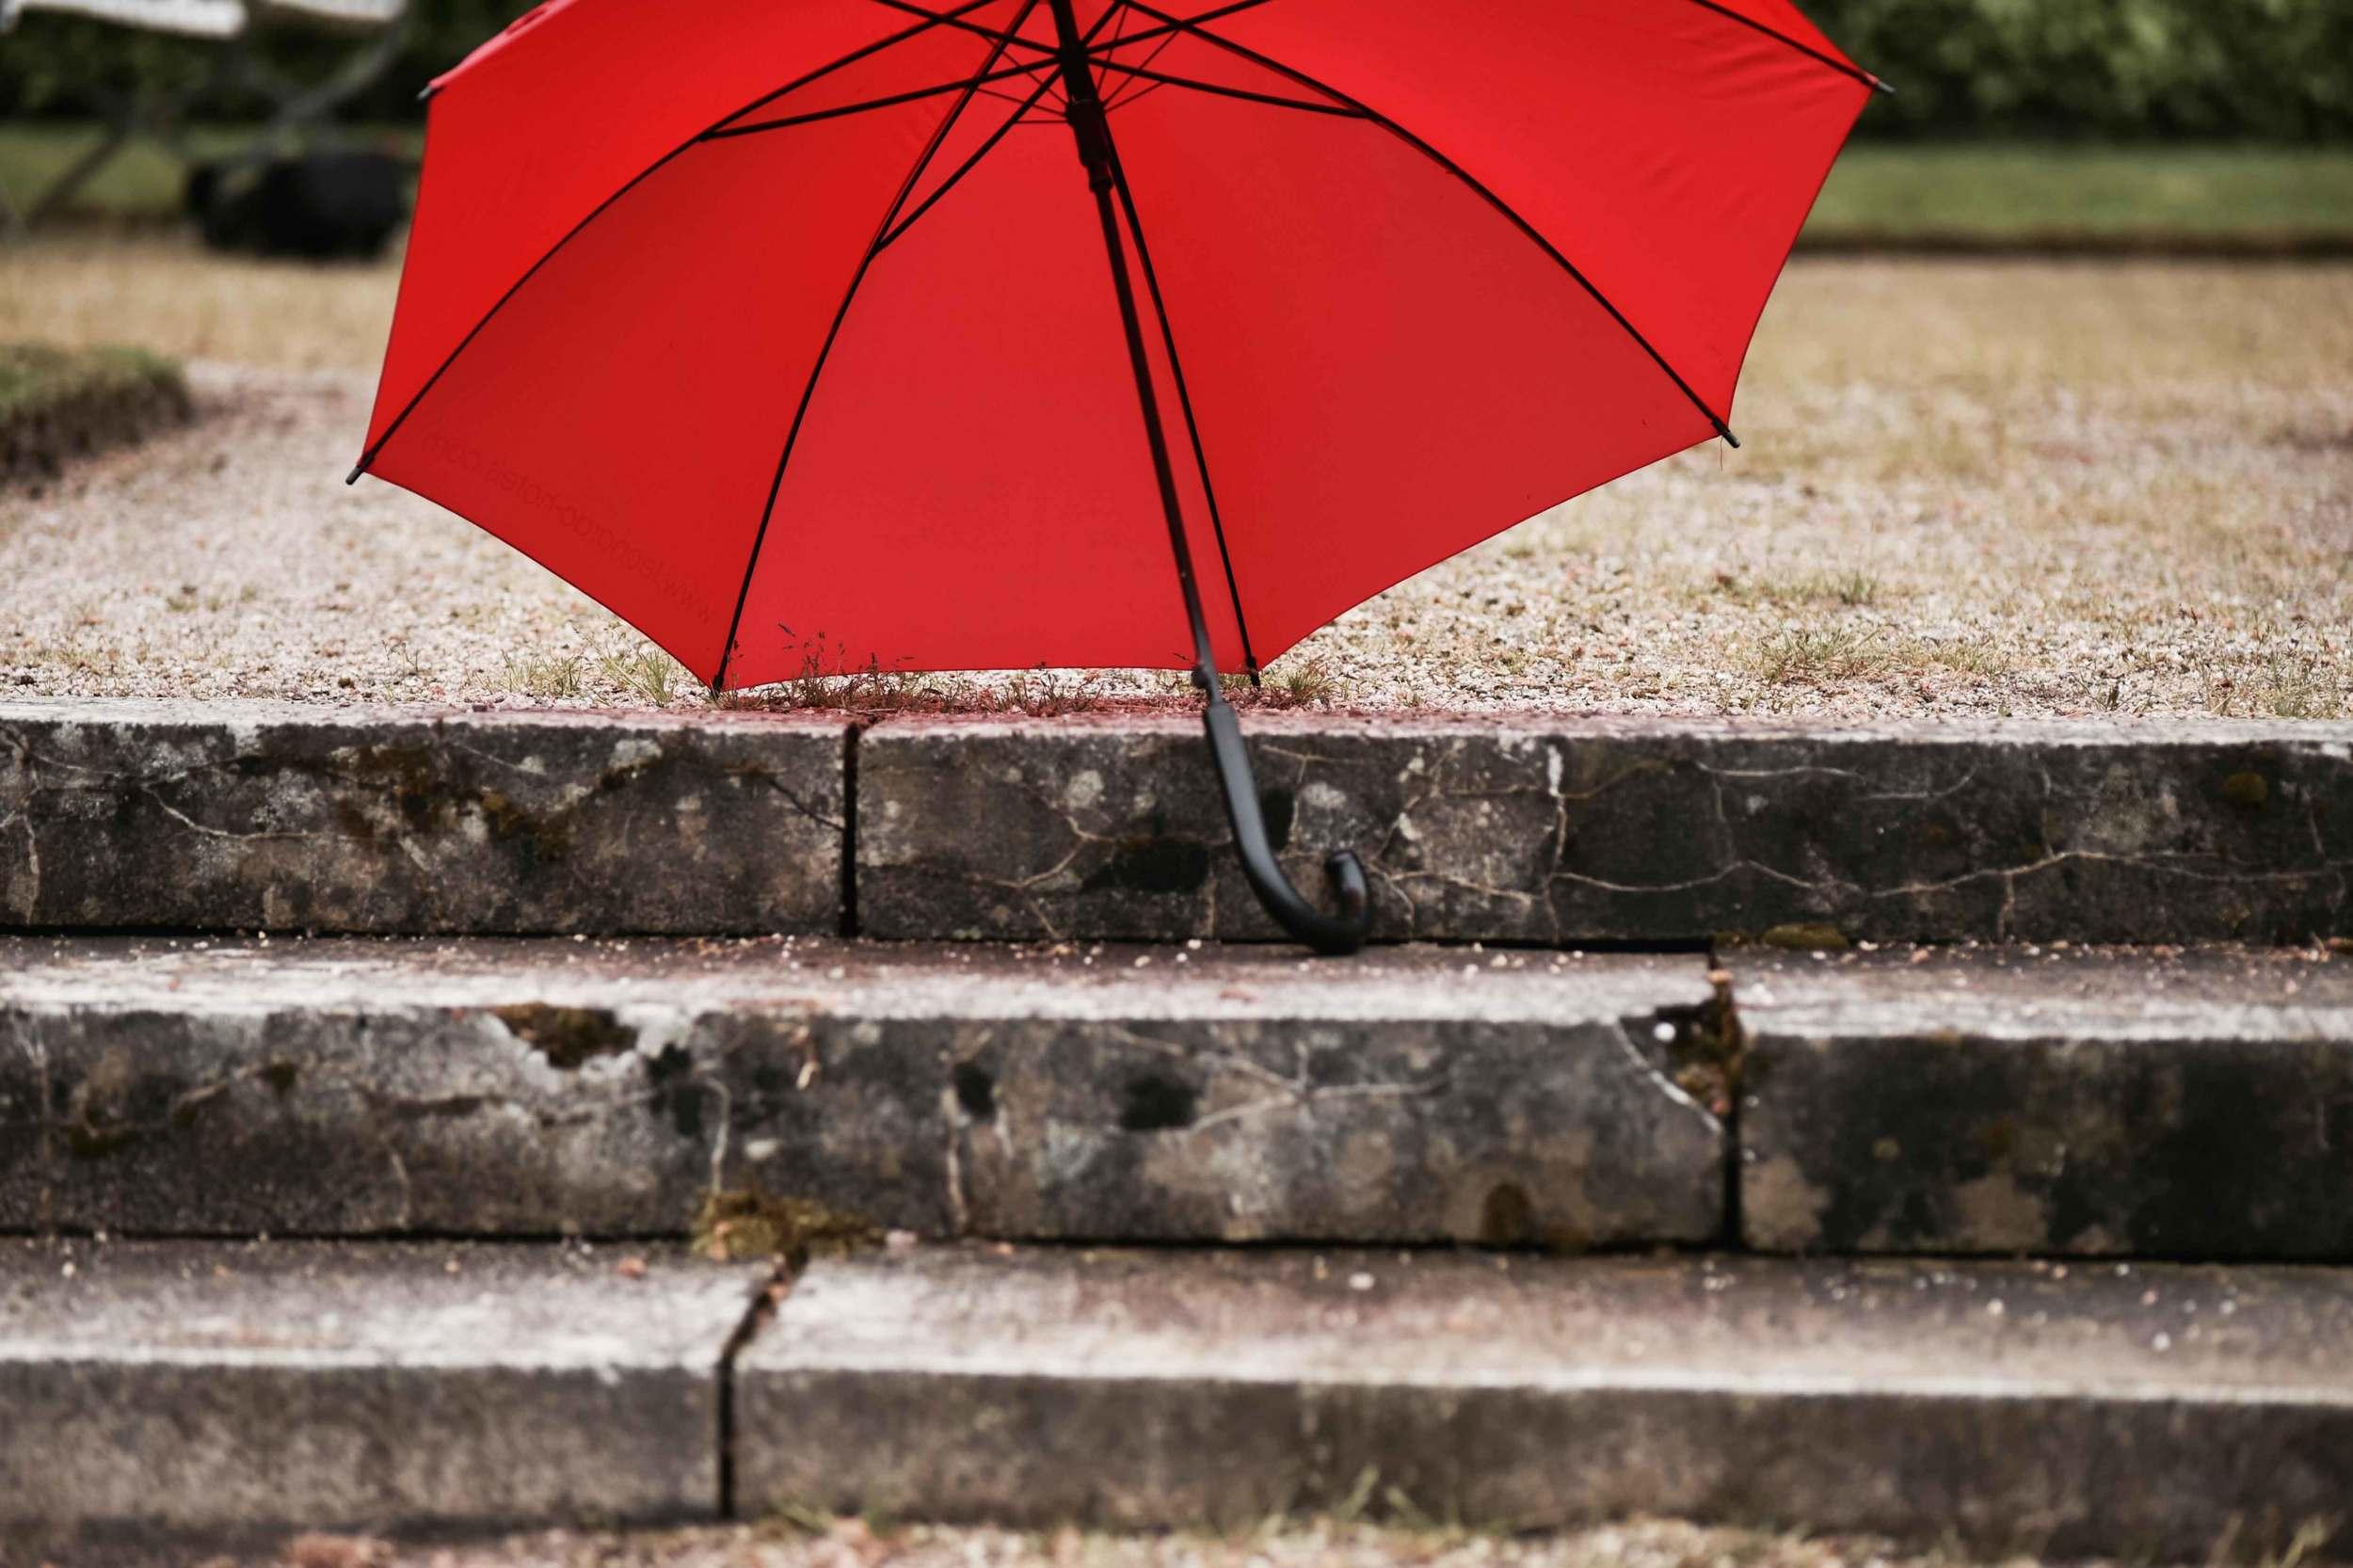 A red umbrella, Gönneranlage, historic park, Baden Baden, Germany. Image©sourcingstyle.com